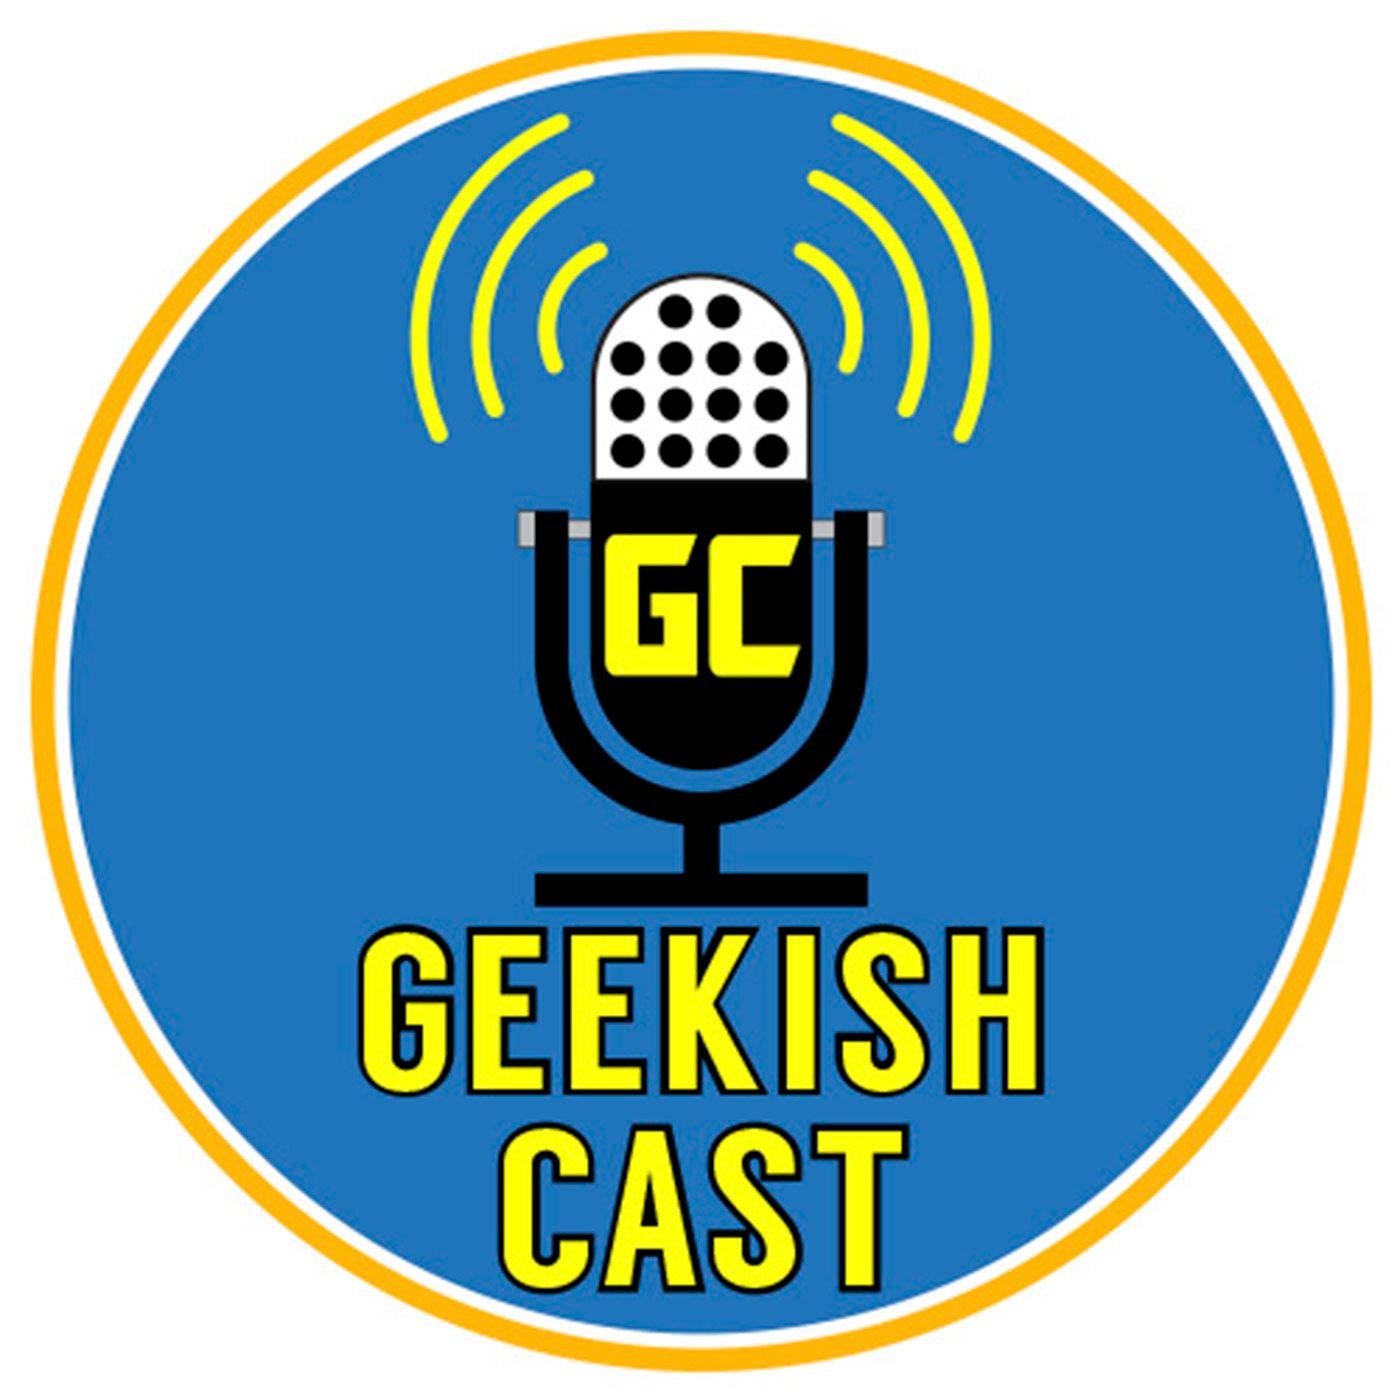 Geekish Cast